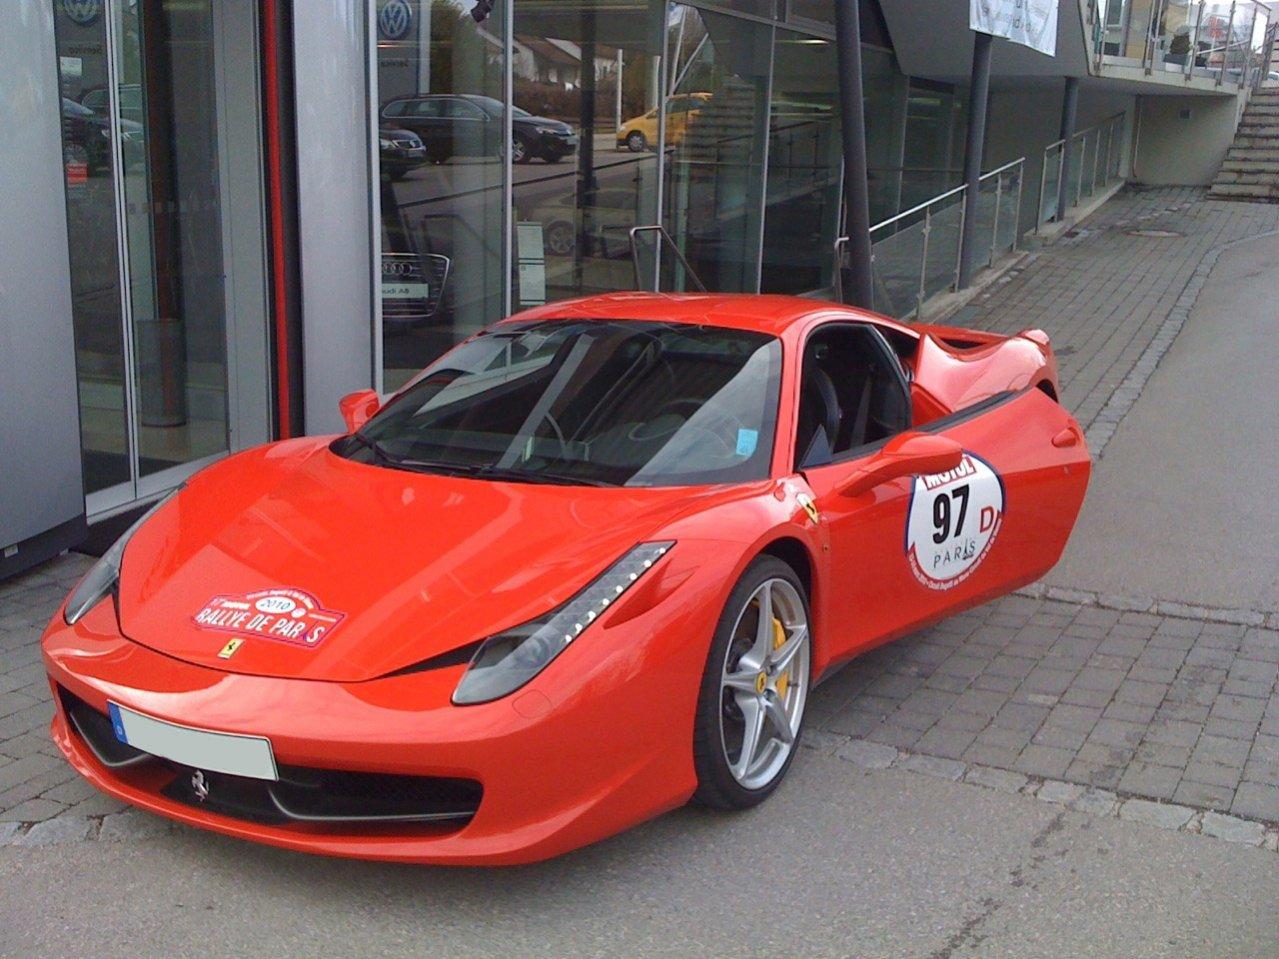 Probefahrt mit dem Ferrari 458 Italia